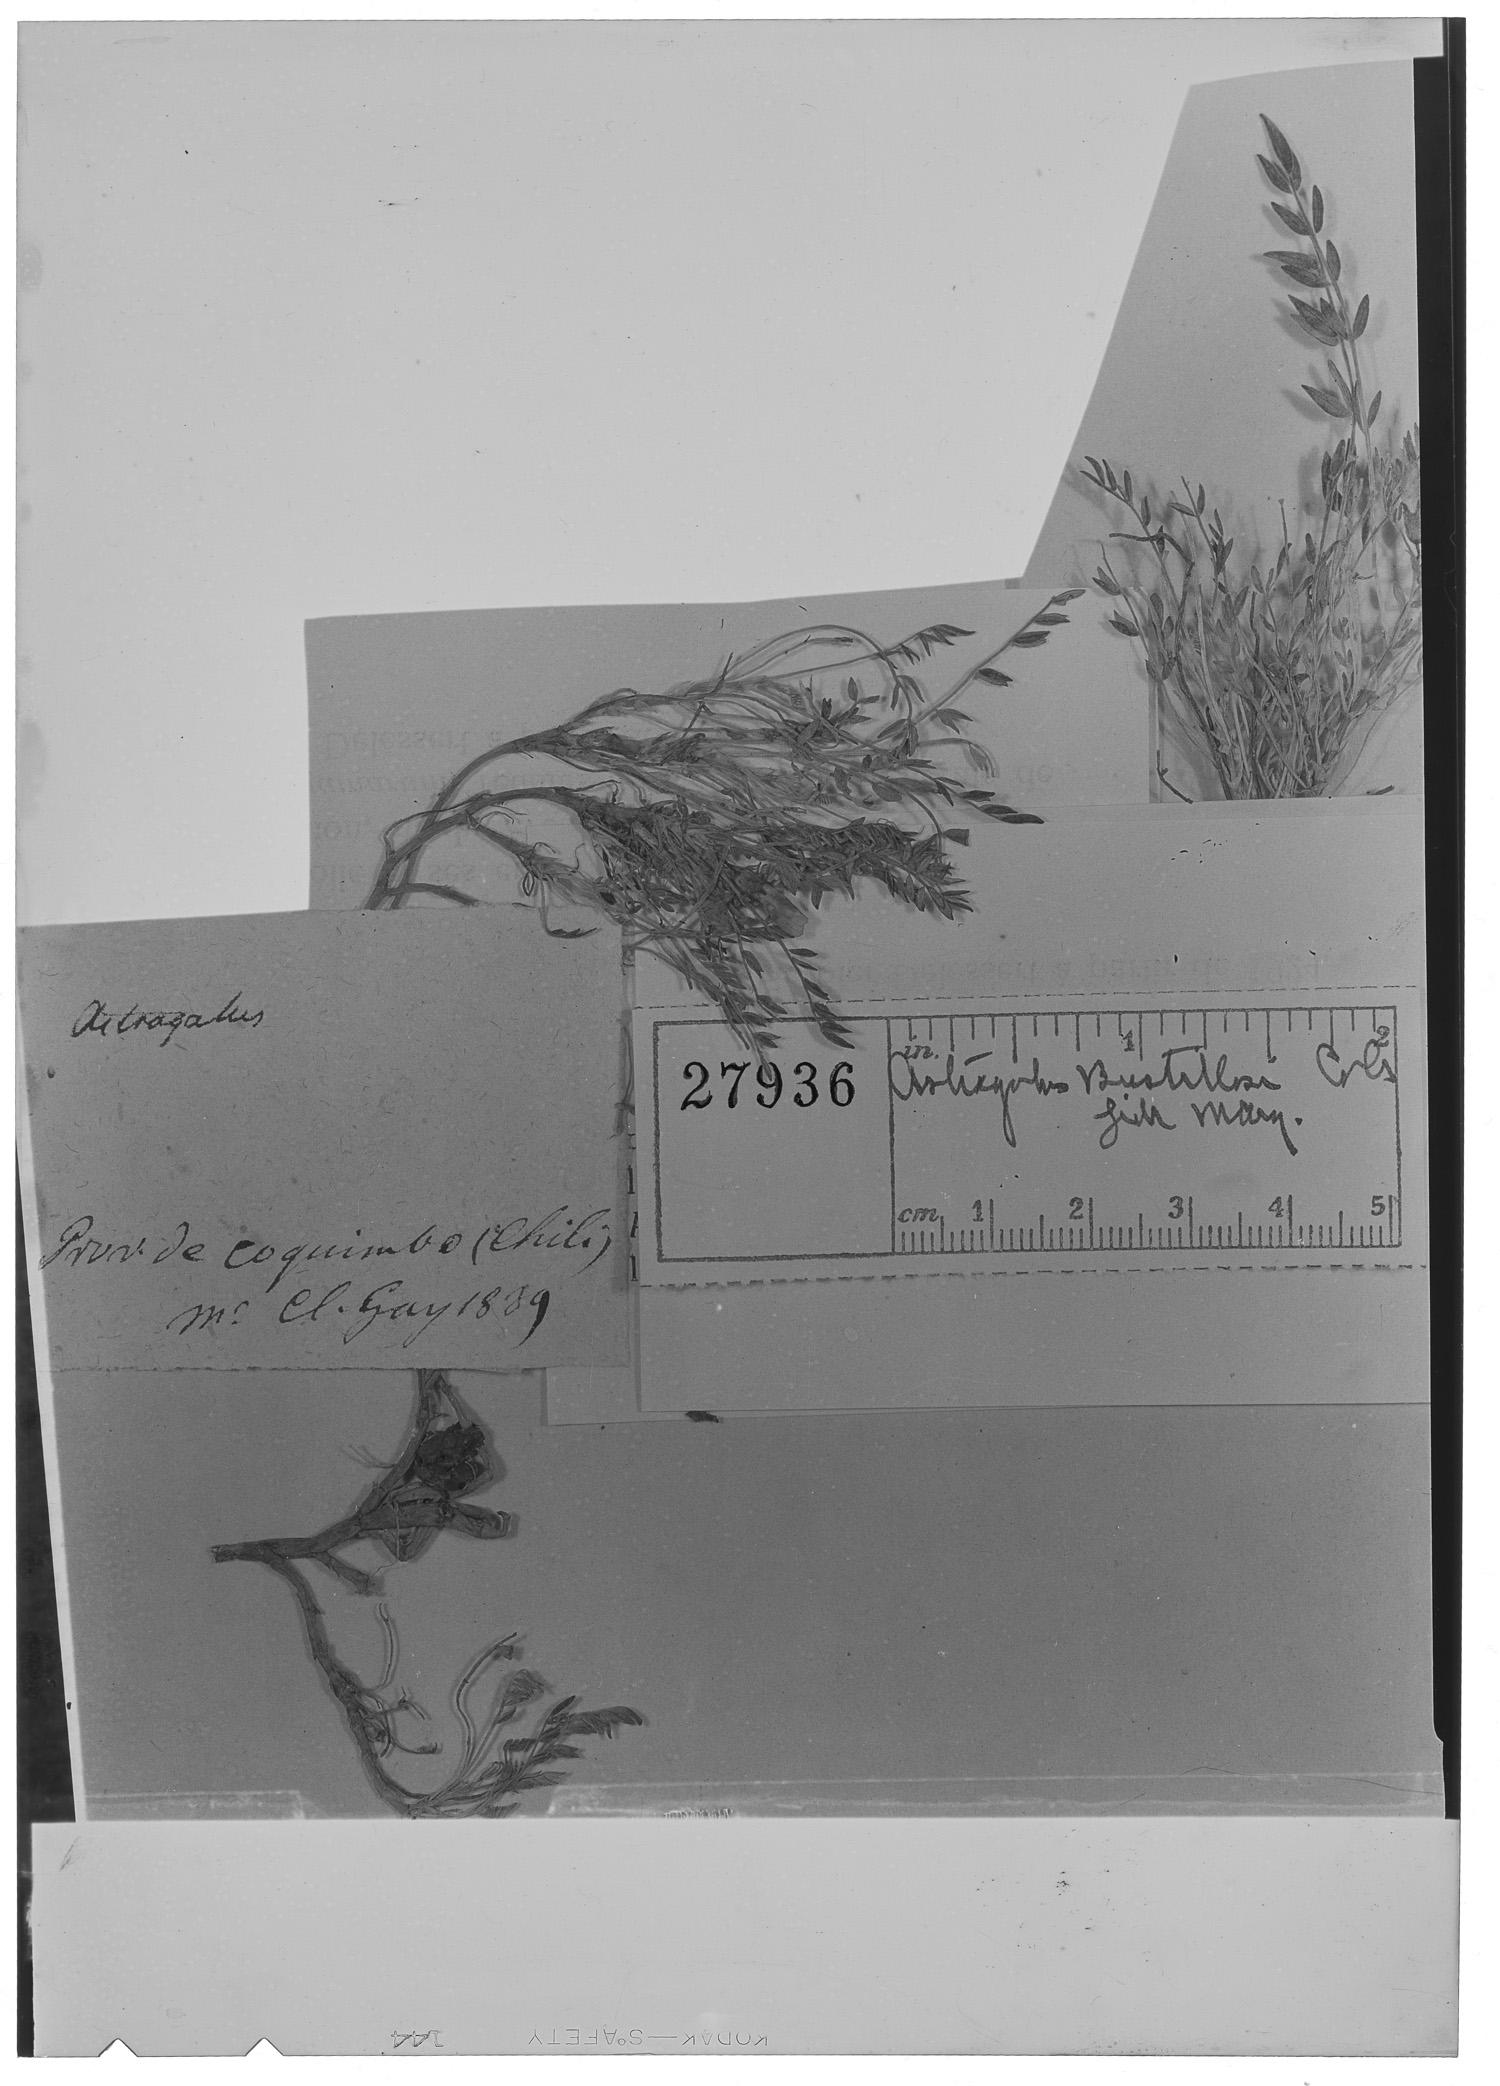 Astragalus bustillosii image